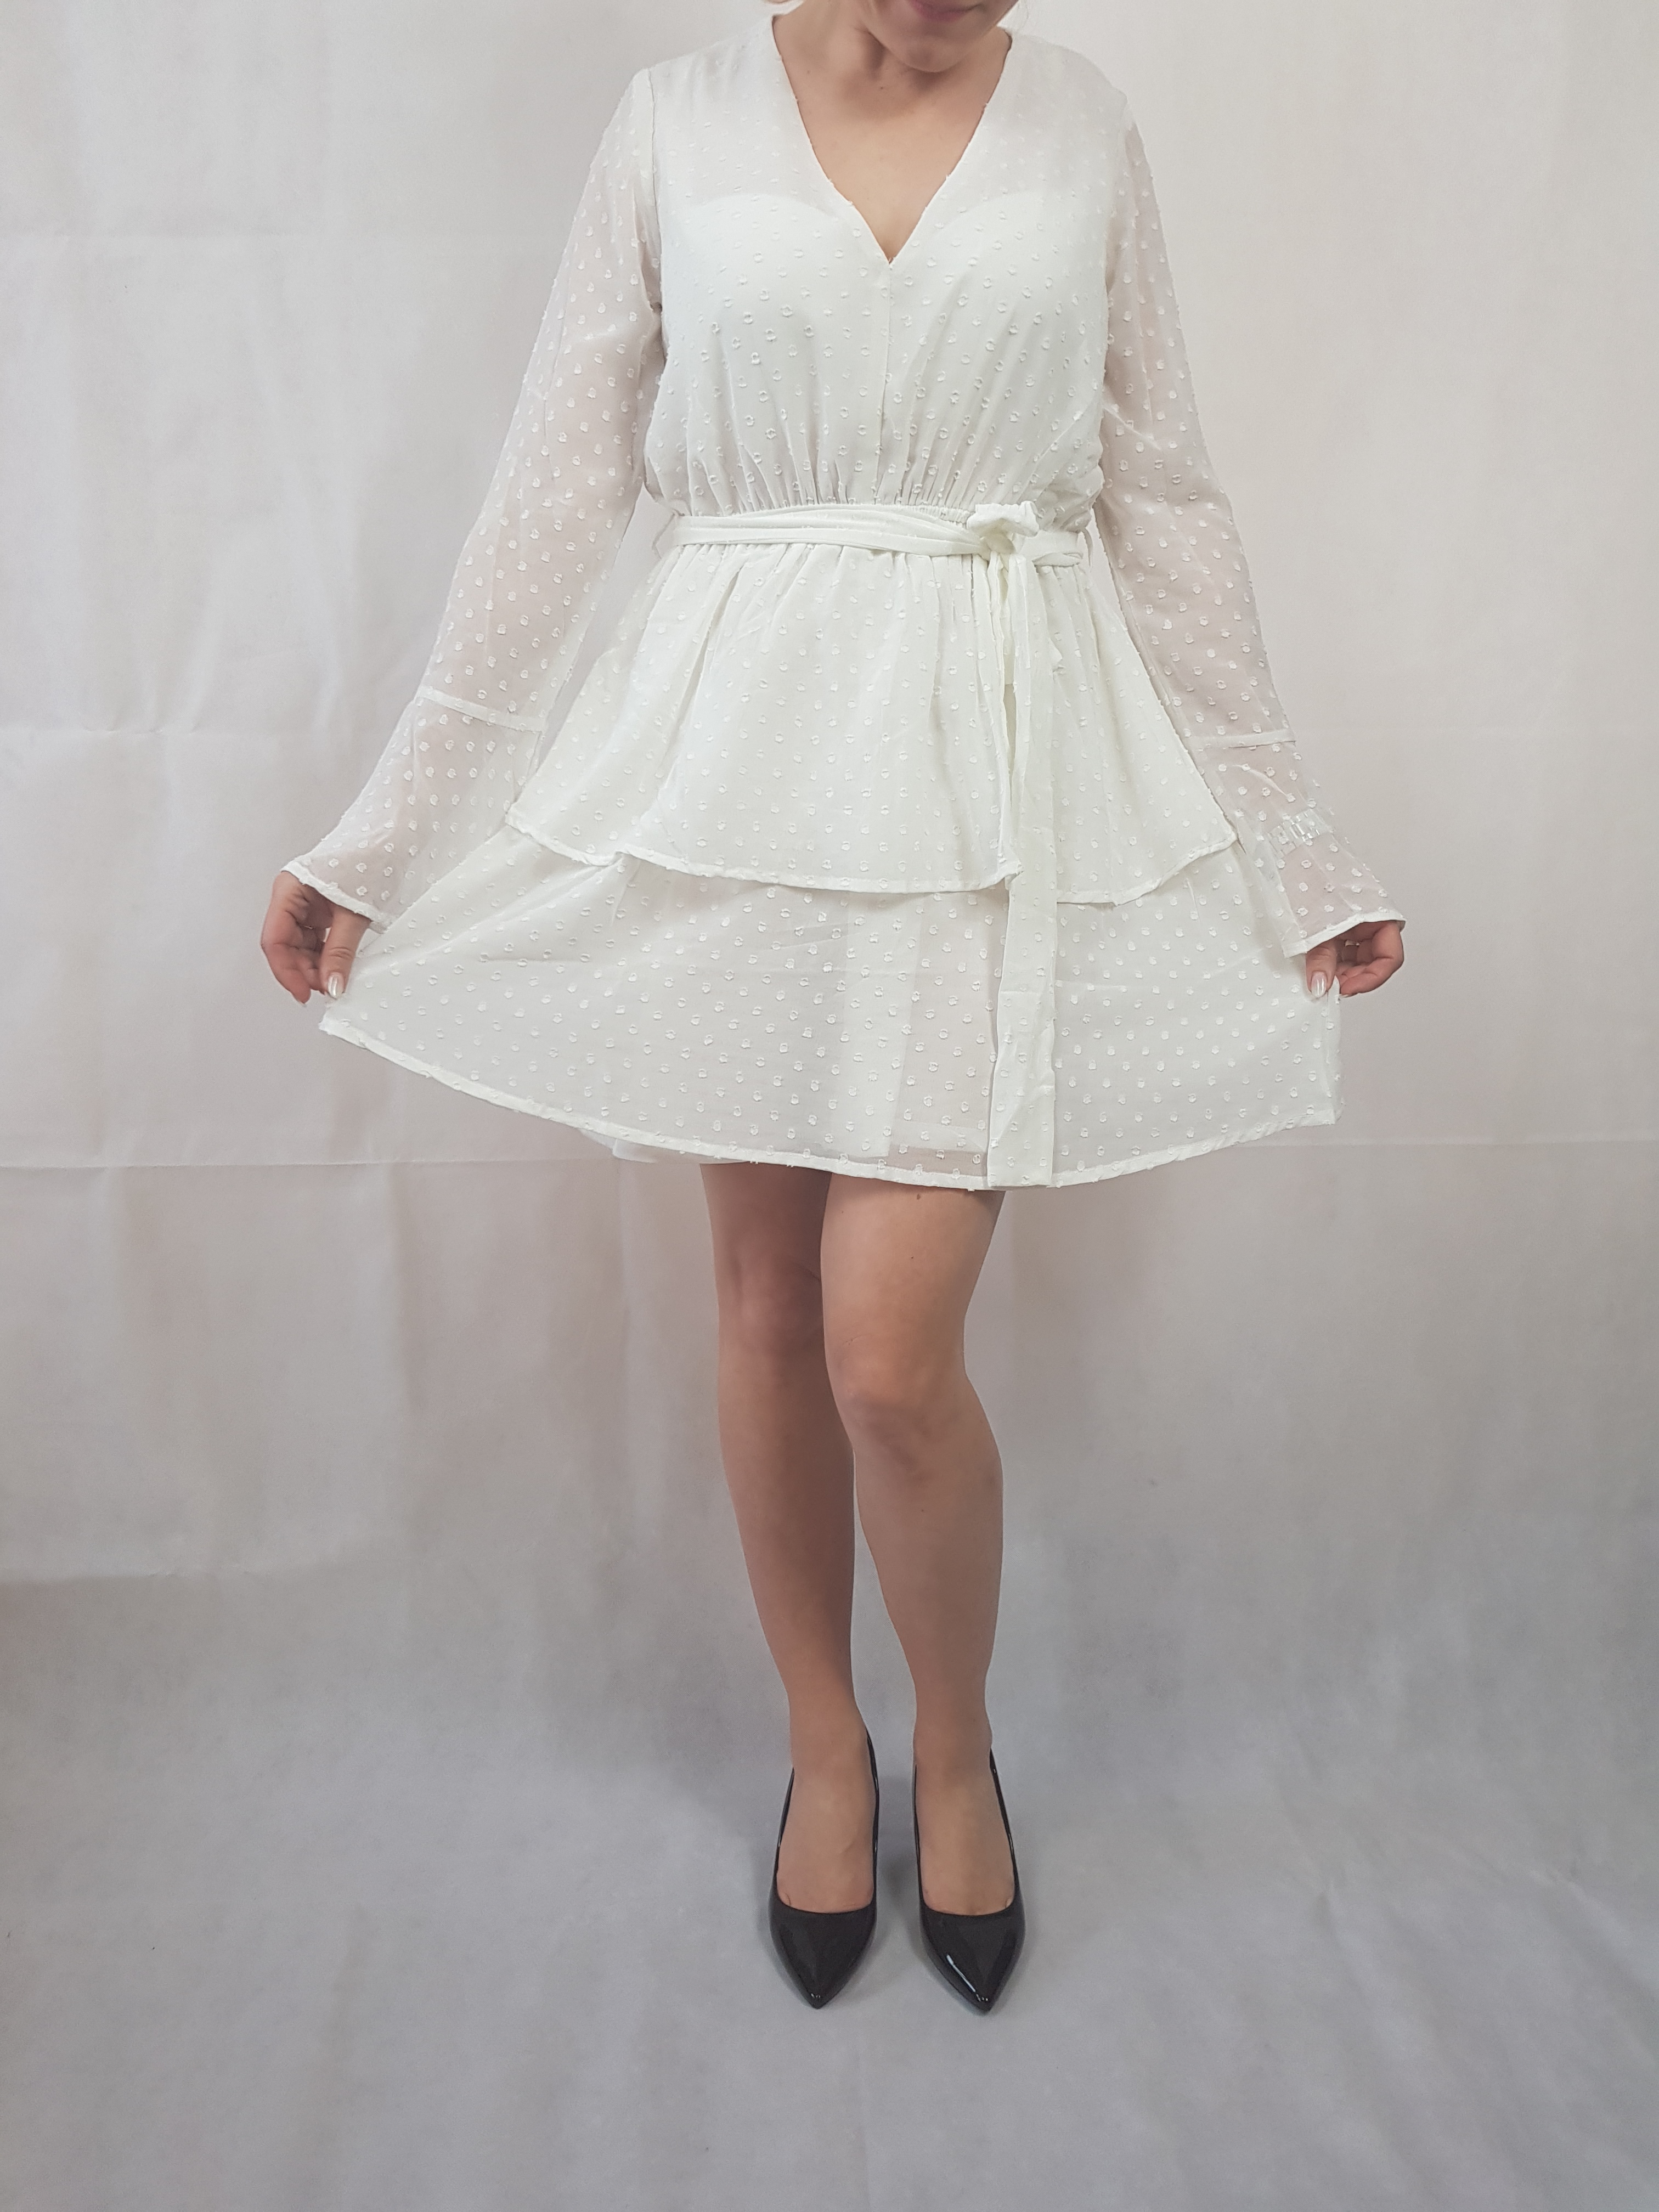 5b62bdc4fa16 Dámske letné koktejlové šaty